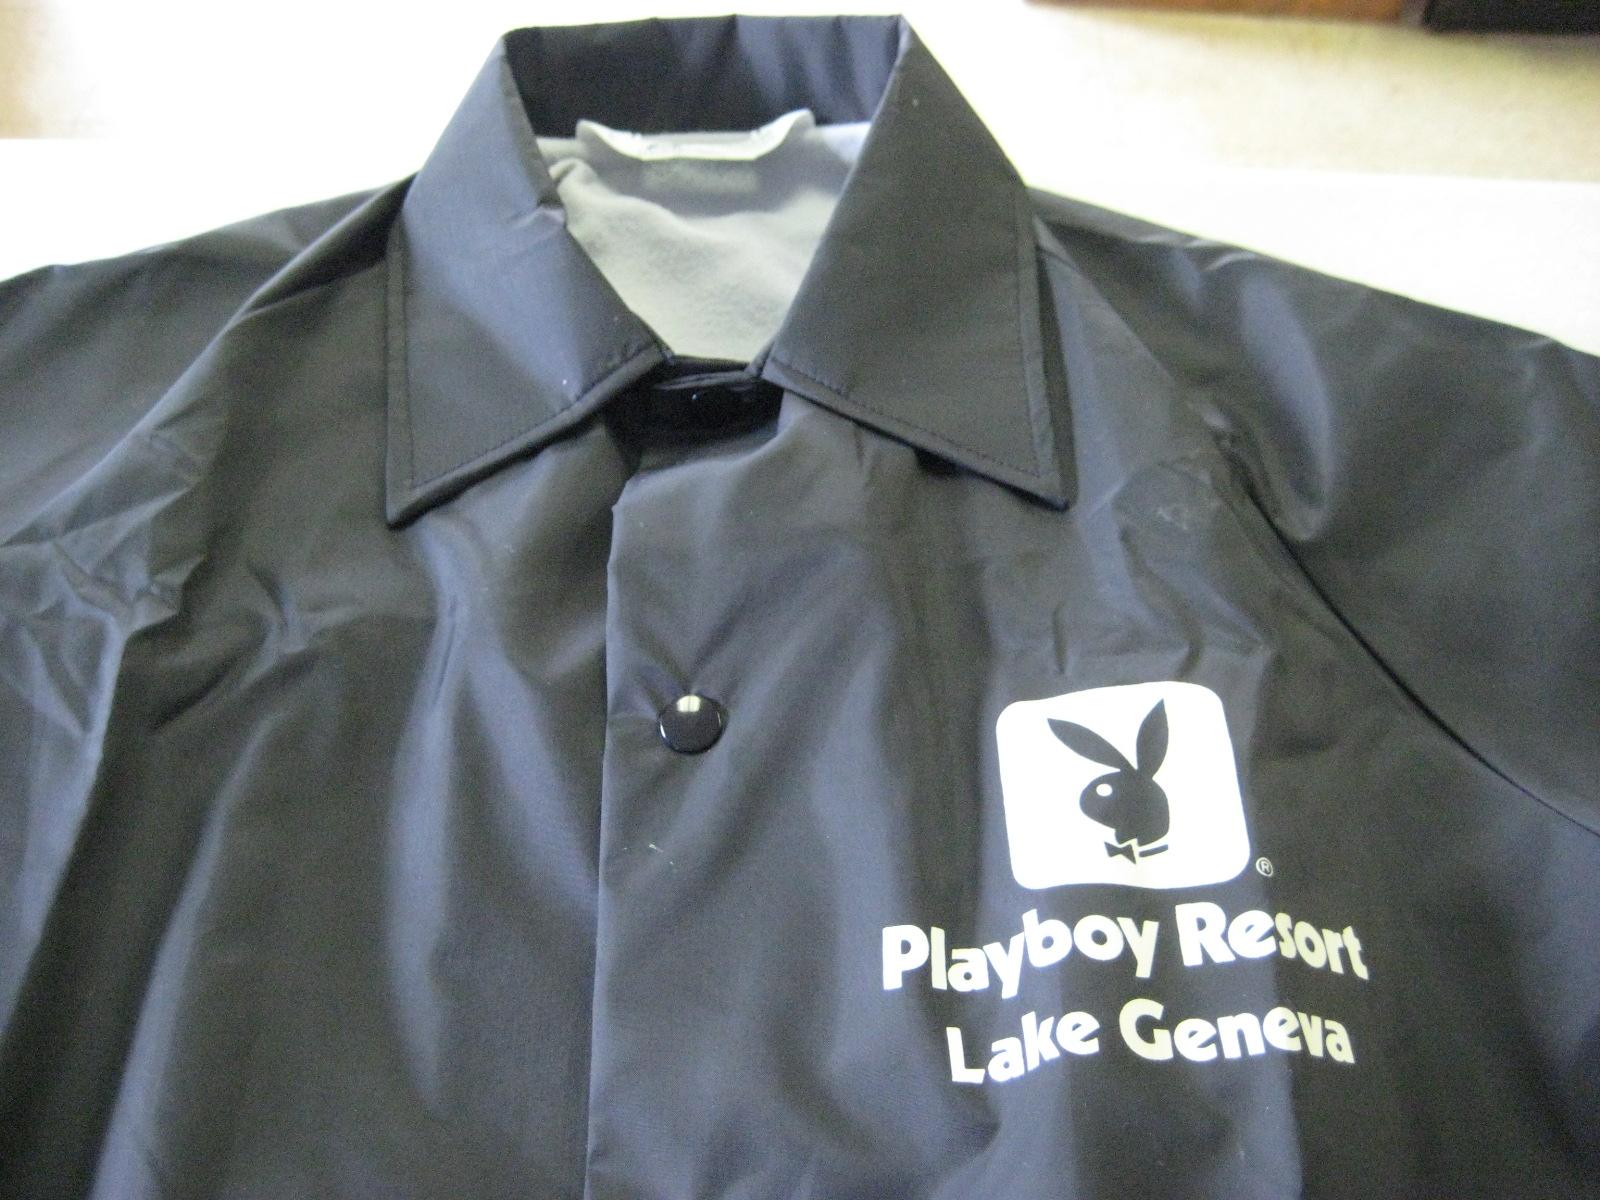 Playboy Club Lake Geneva Windbreaker